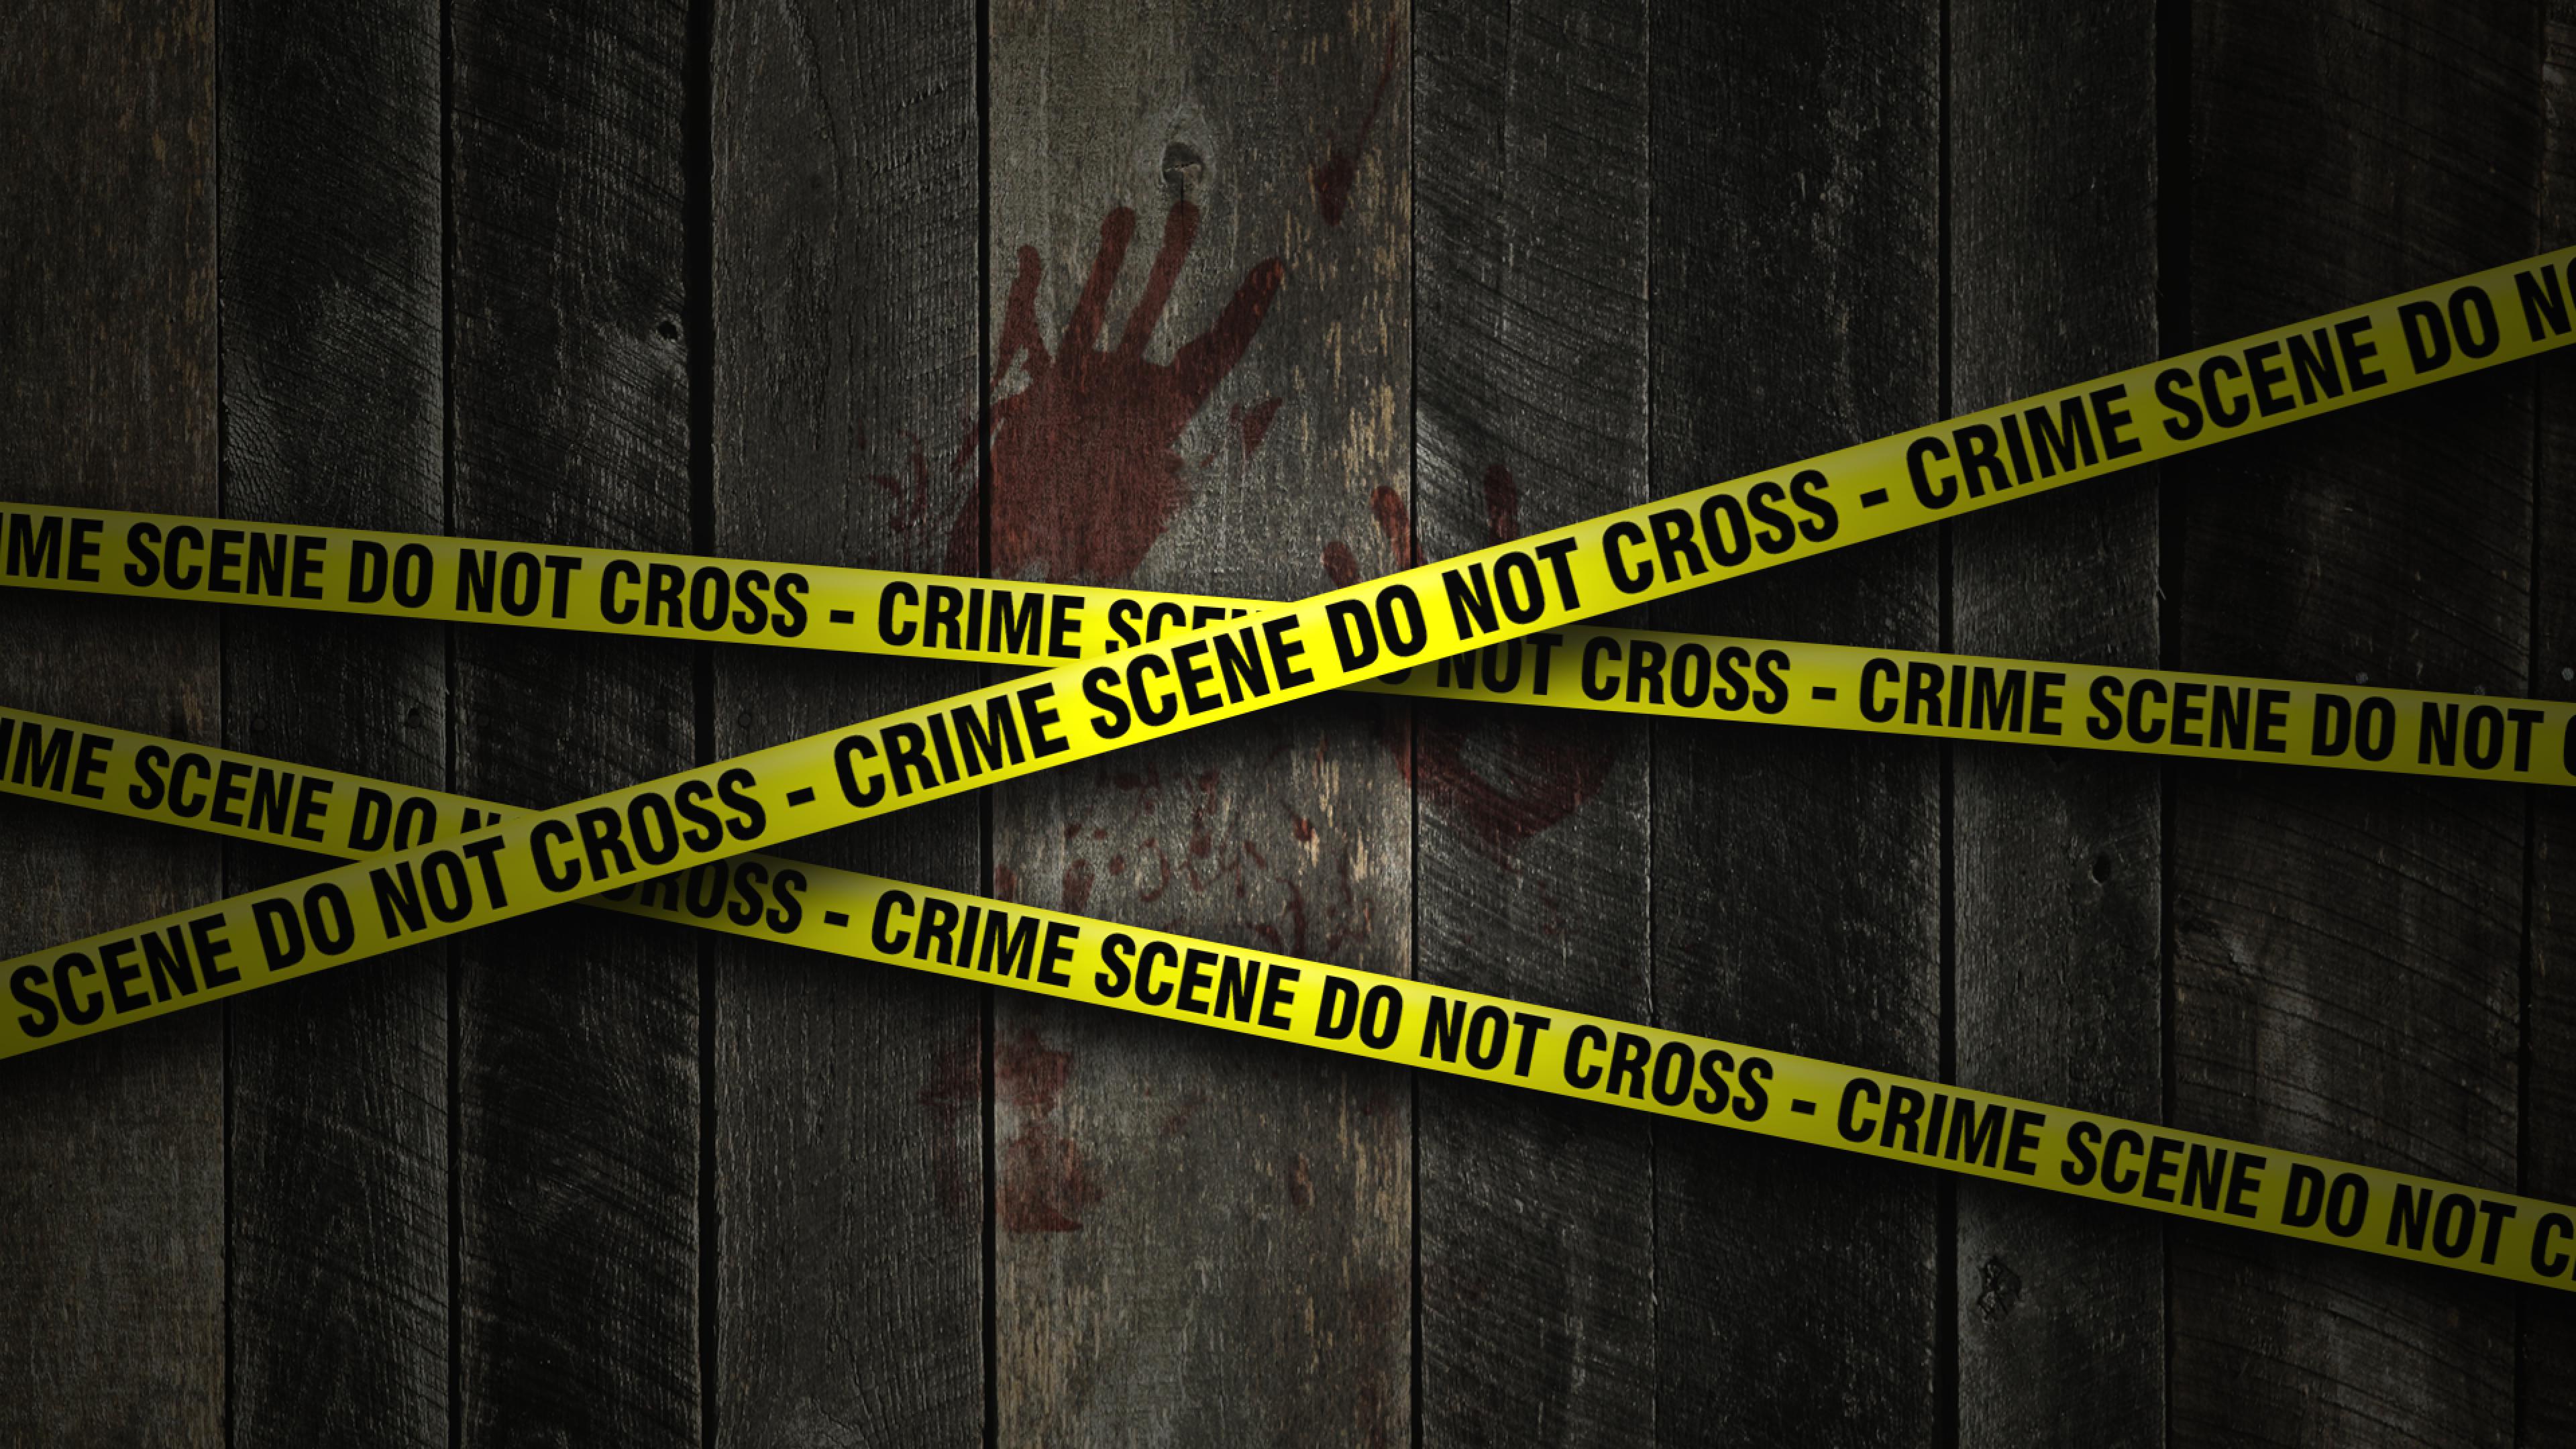 Crime scene yellow tape #1 - Crime Scene PNG HD